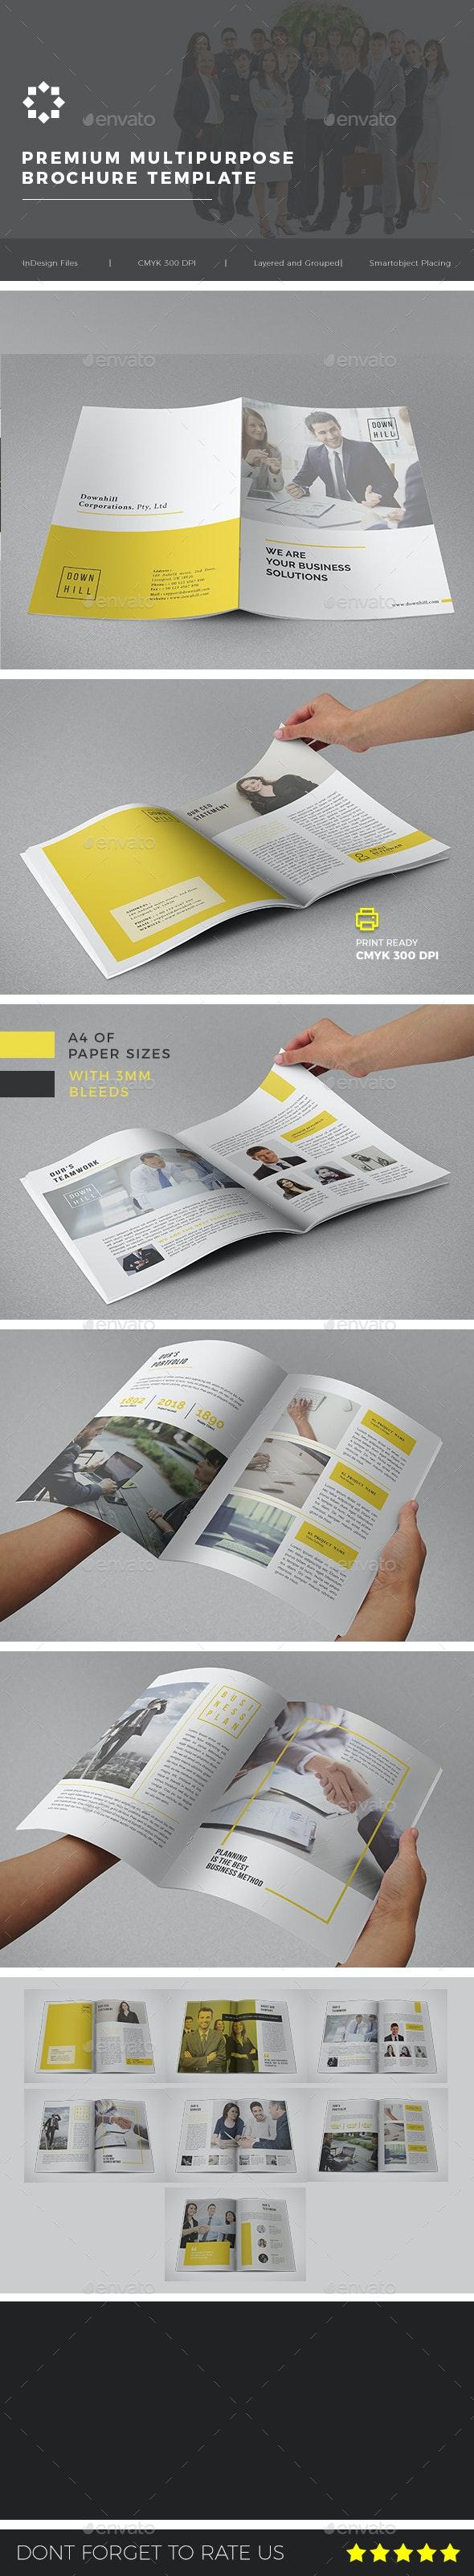 Multipurpose Corporate Brochure Template Vol. 02 - Brochures Print Templates